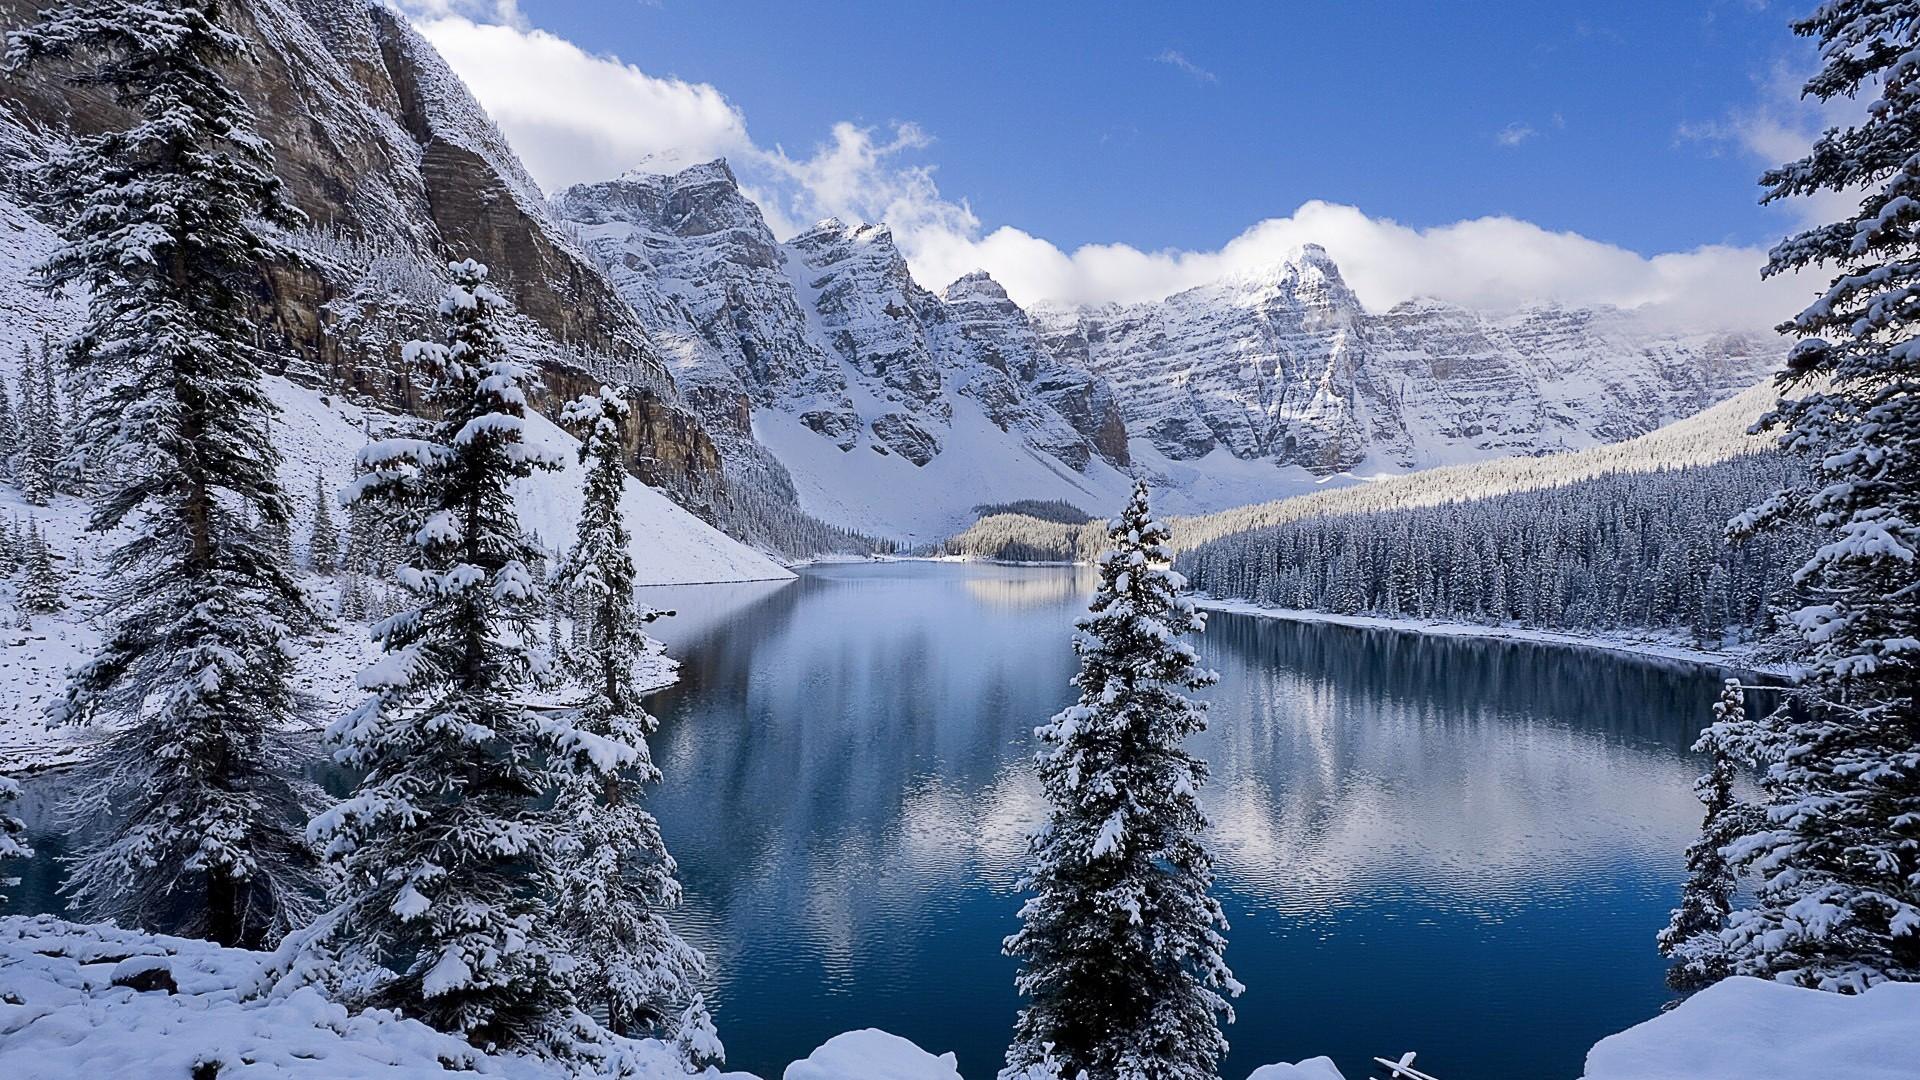 Winter: a wonderland of deathly beauty